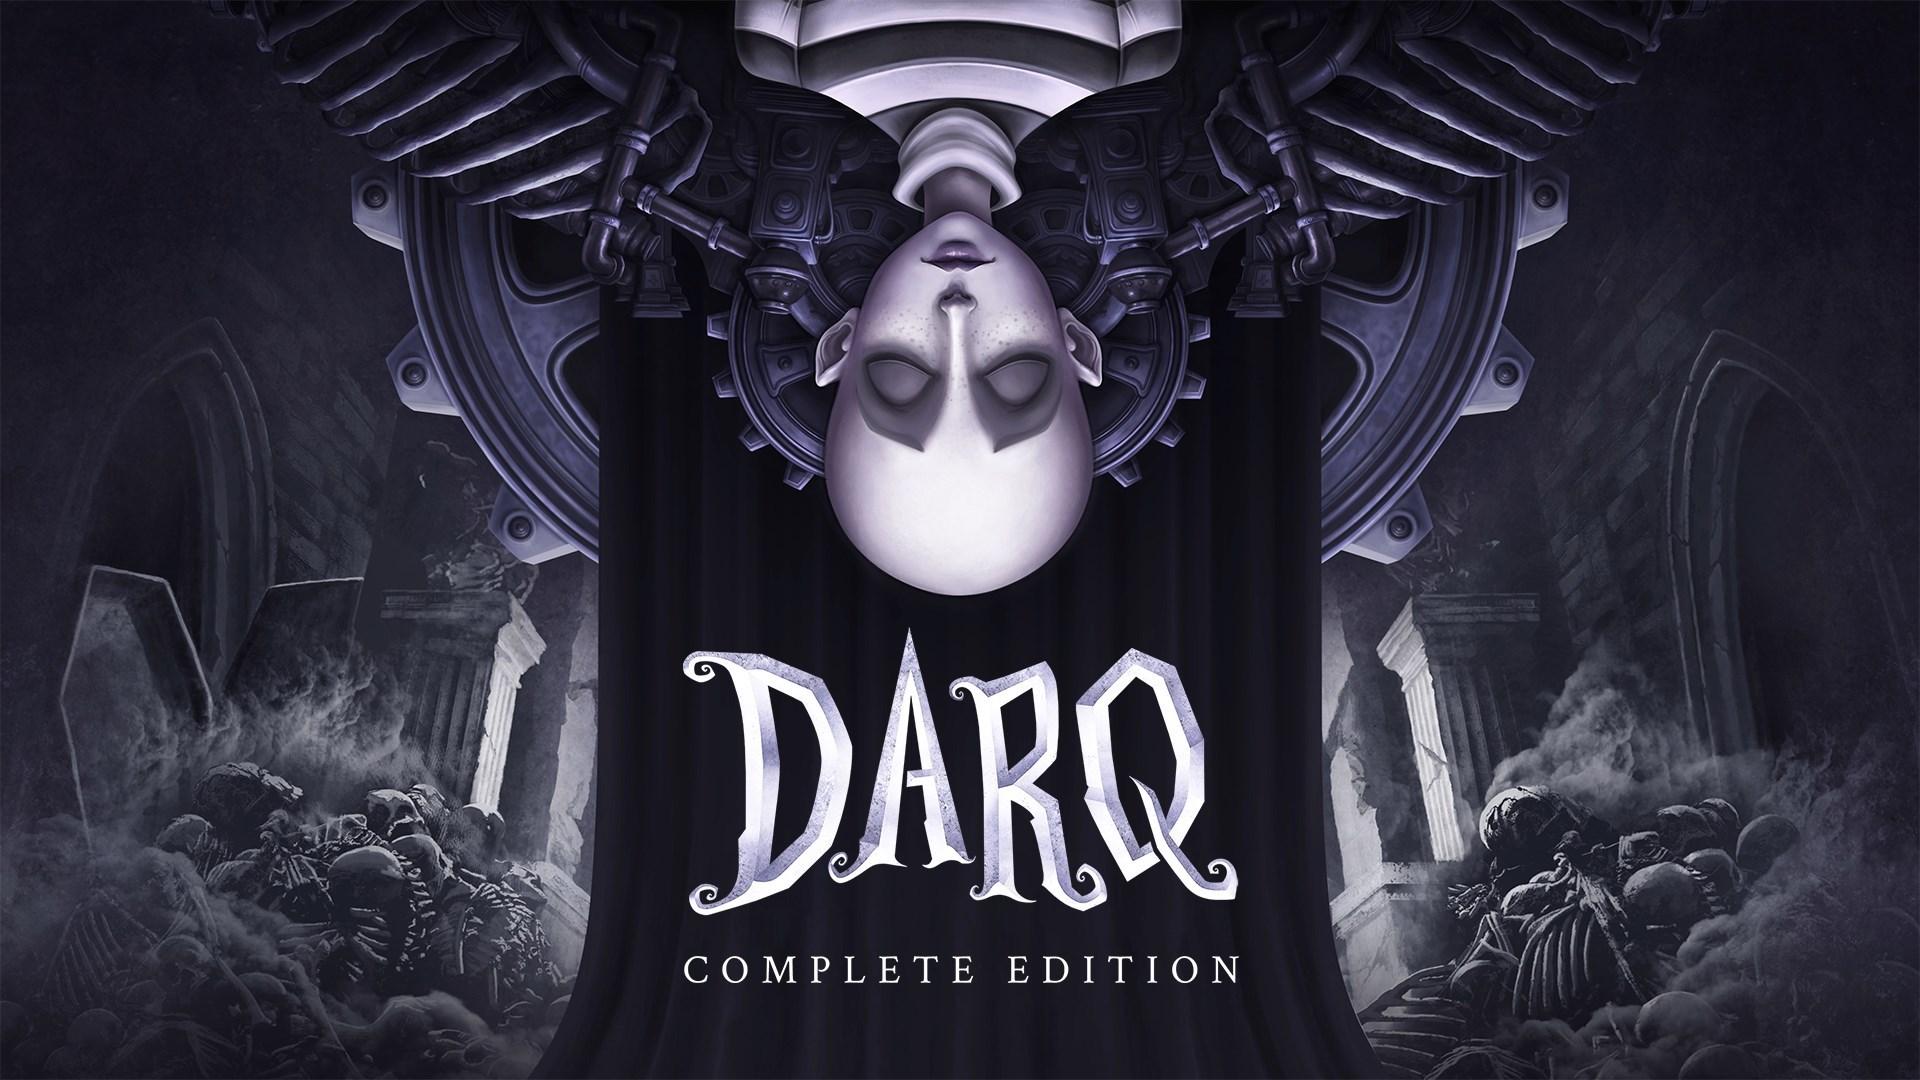 darq complete edition wallpaper 74071